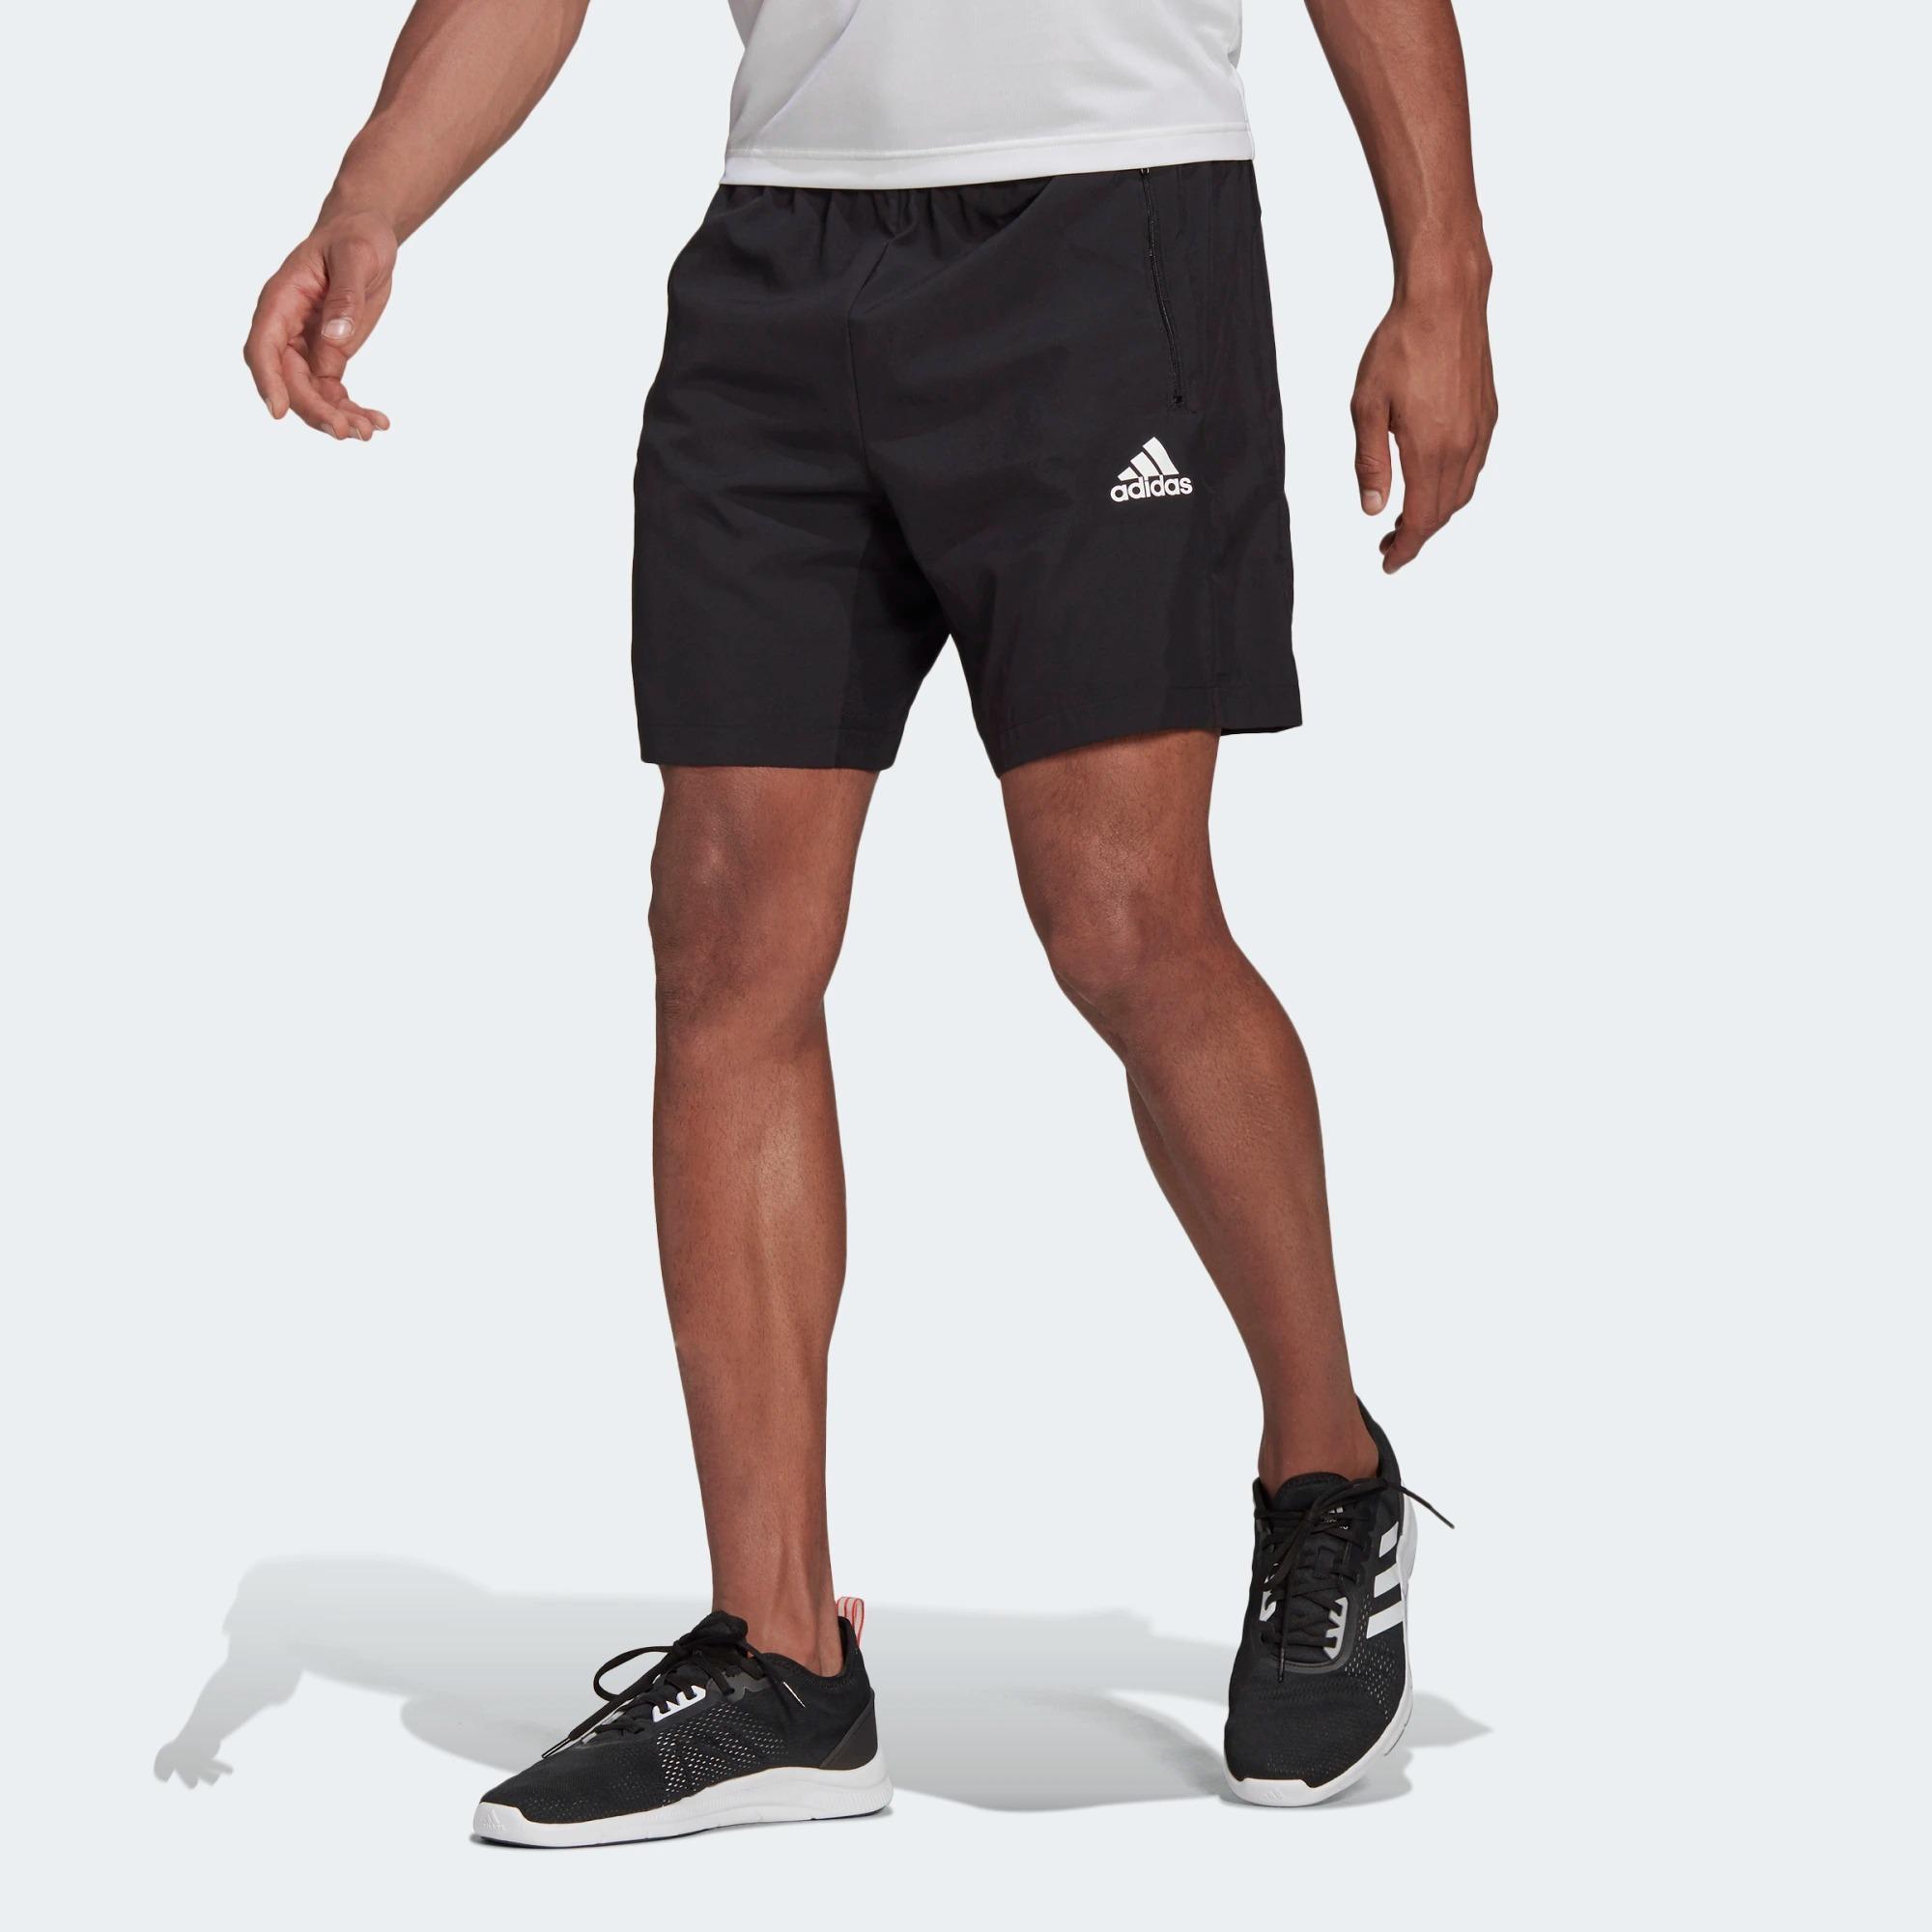 Adidas Aeroready Designed 2 Move Woven Sport Shorts, best men's workout shorts